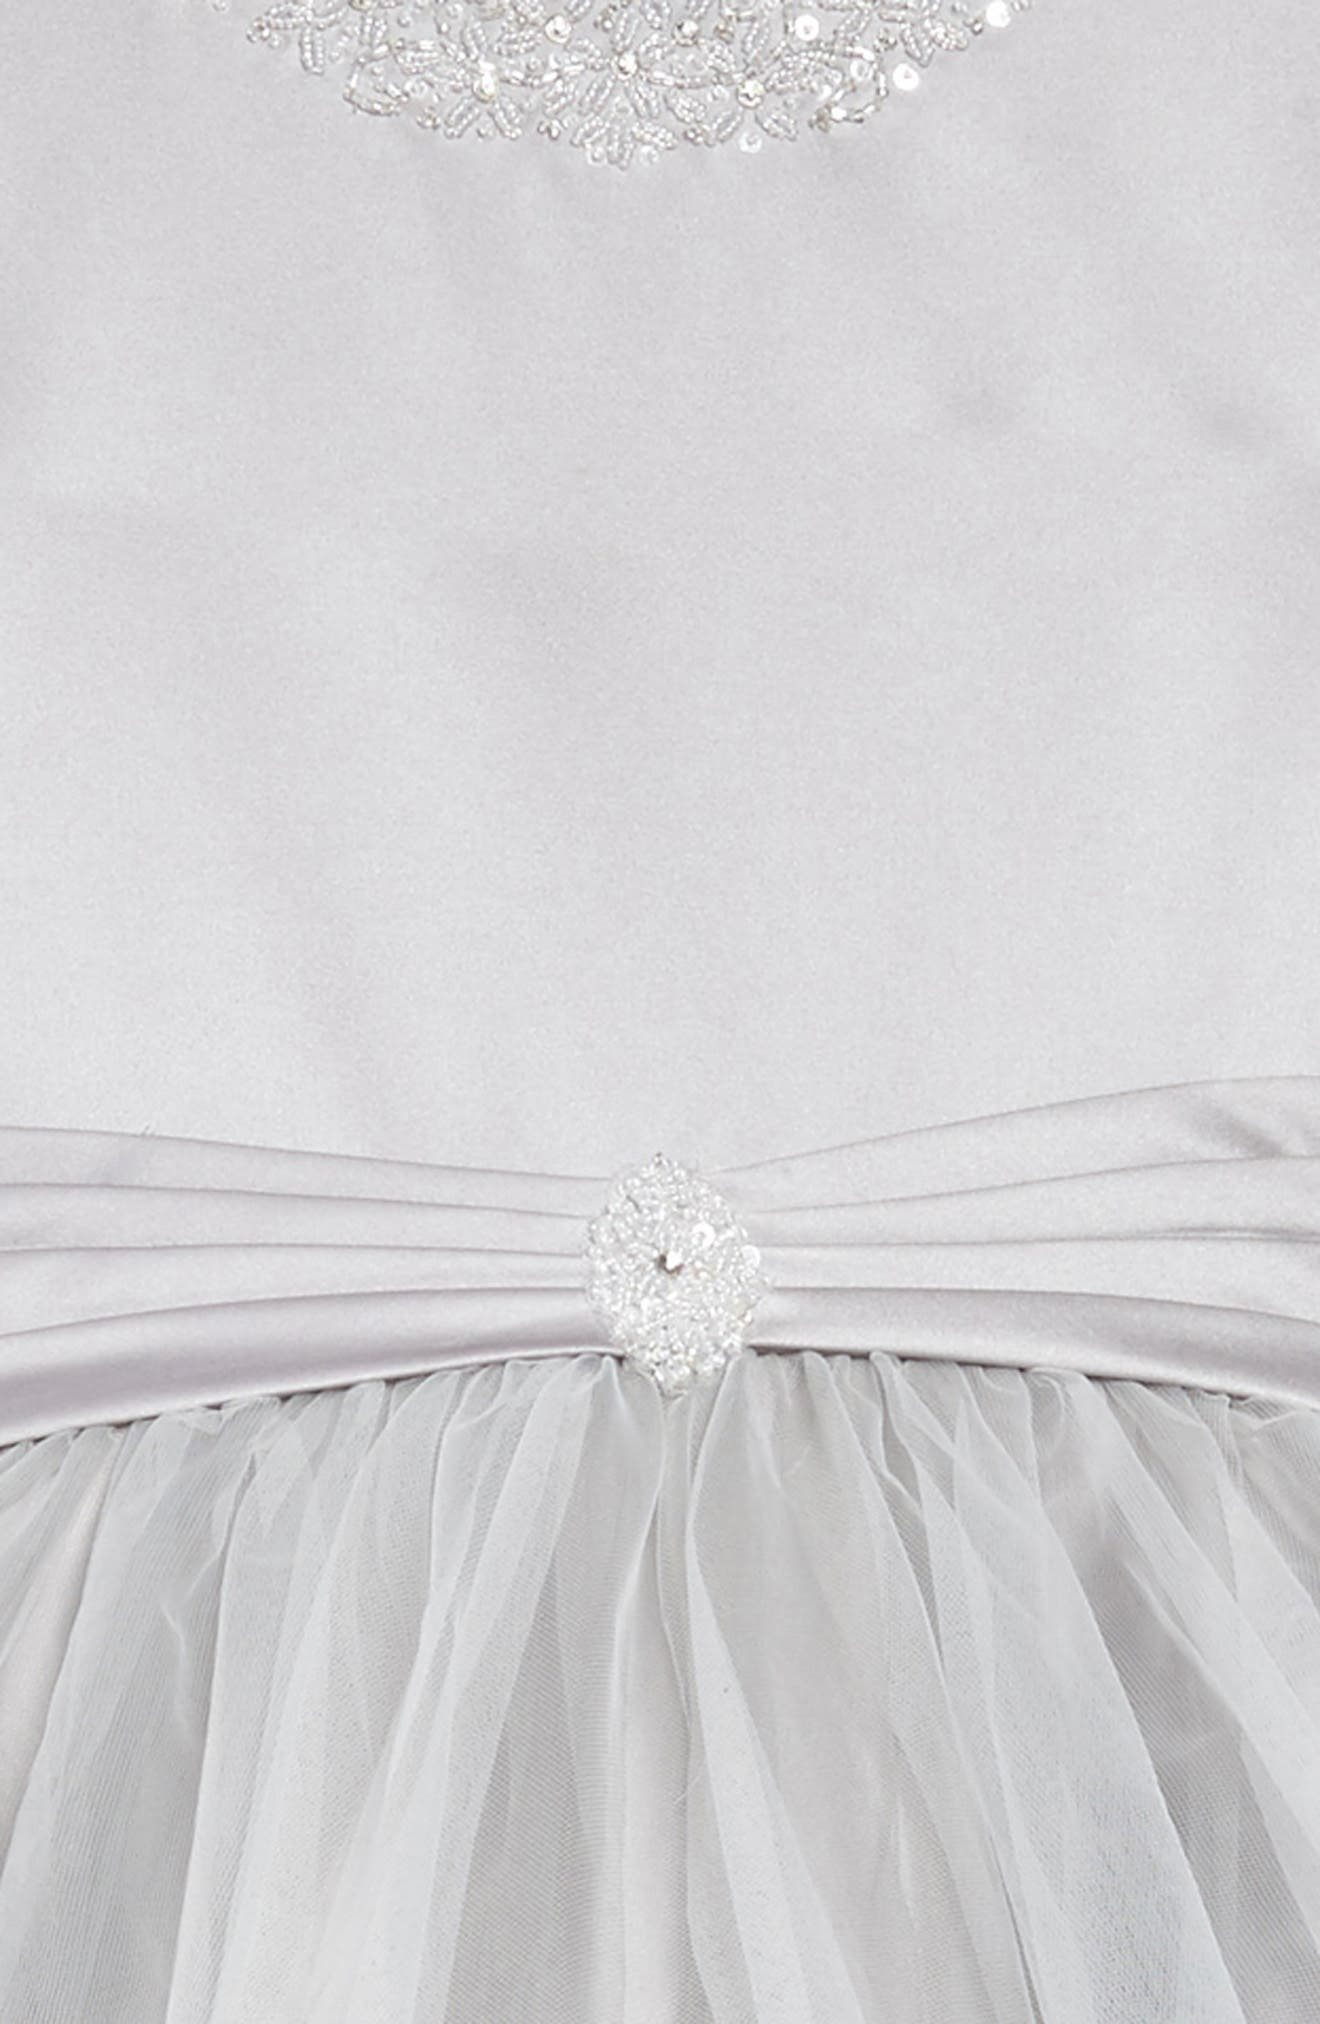 Beaded Satin & Tulle First Communion Dress,                             Alternate thumbnail 3, color,                             040